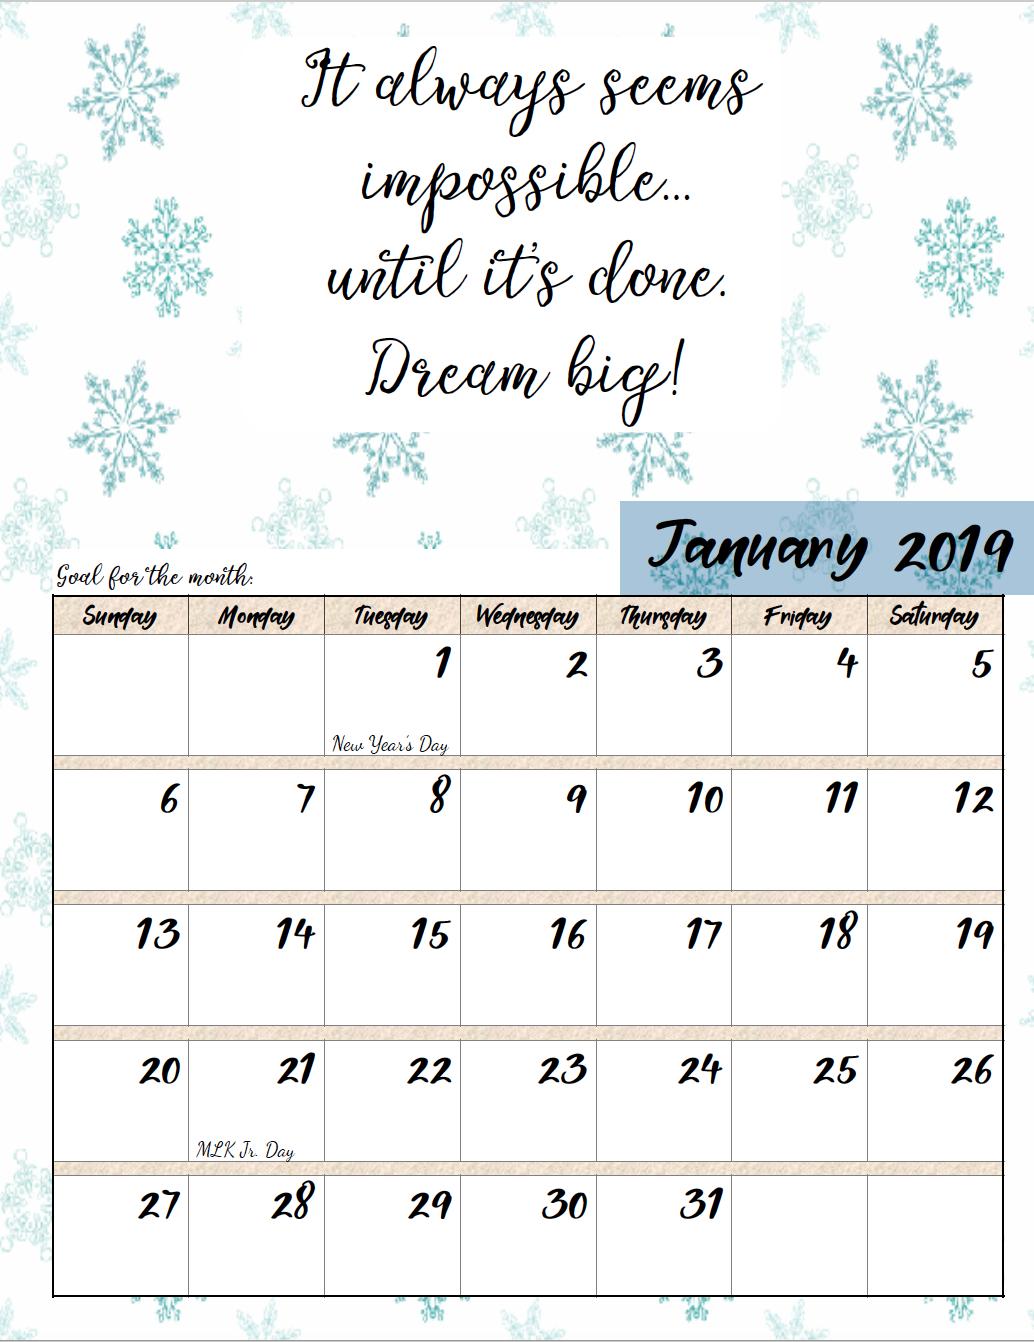 Free Printable 2019 Monthly Motivational Calendars | Morning Prayers Calendar 2019 Inspirational